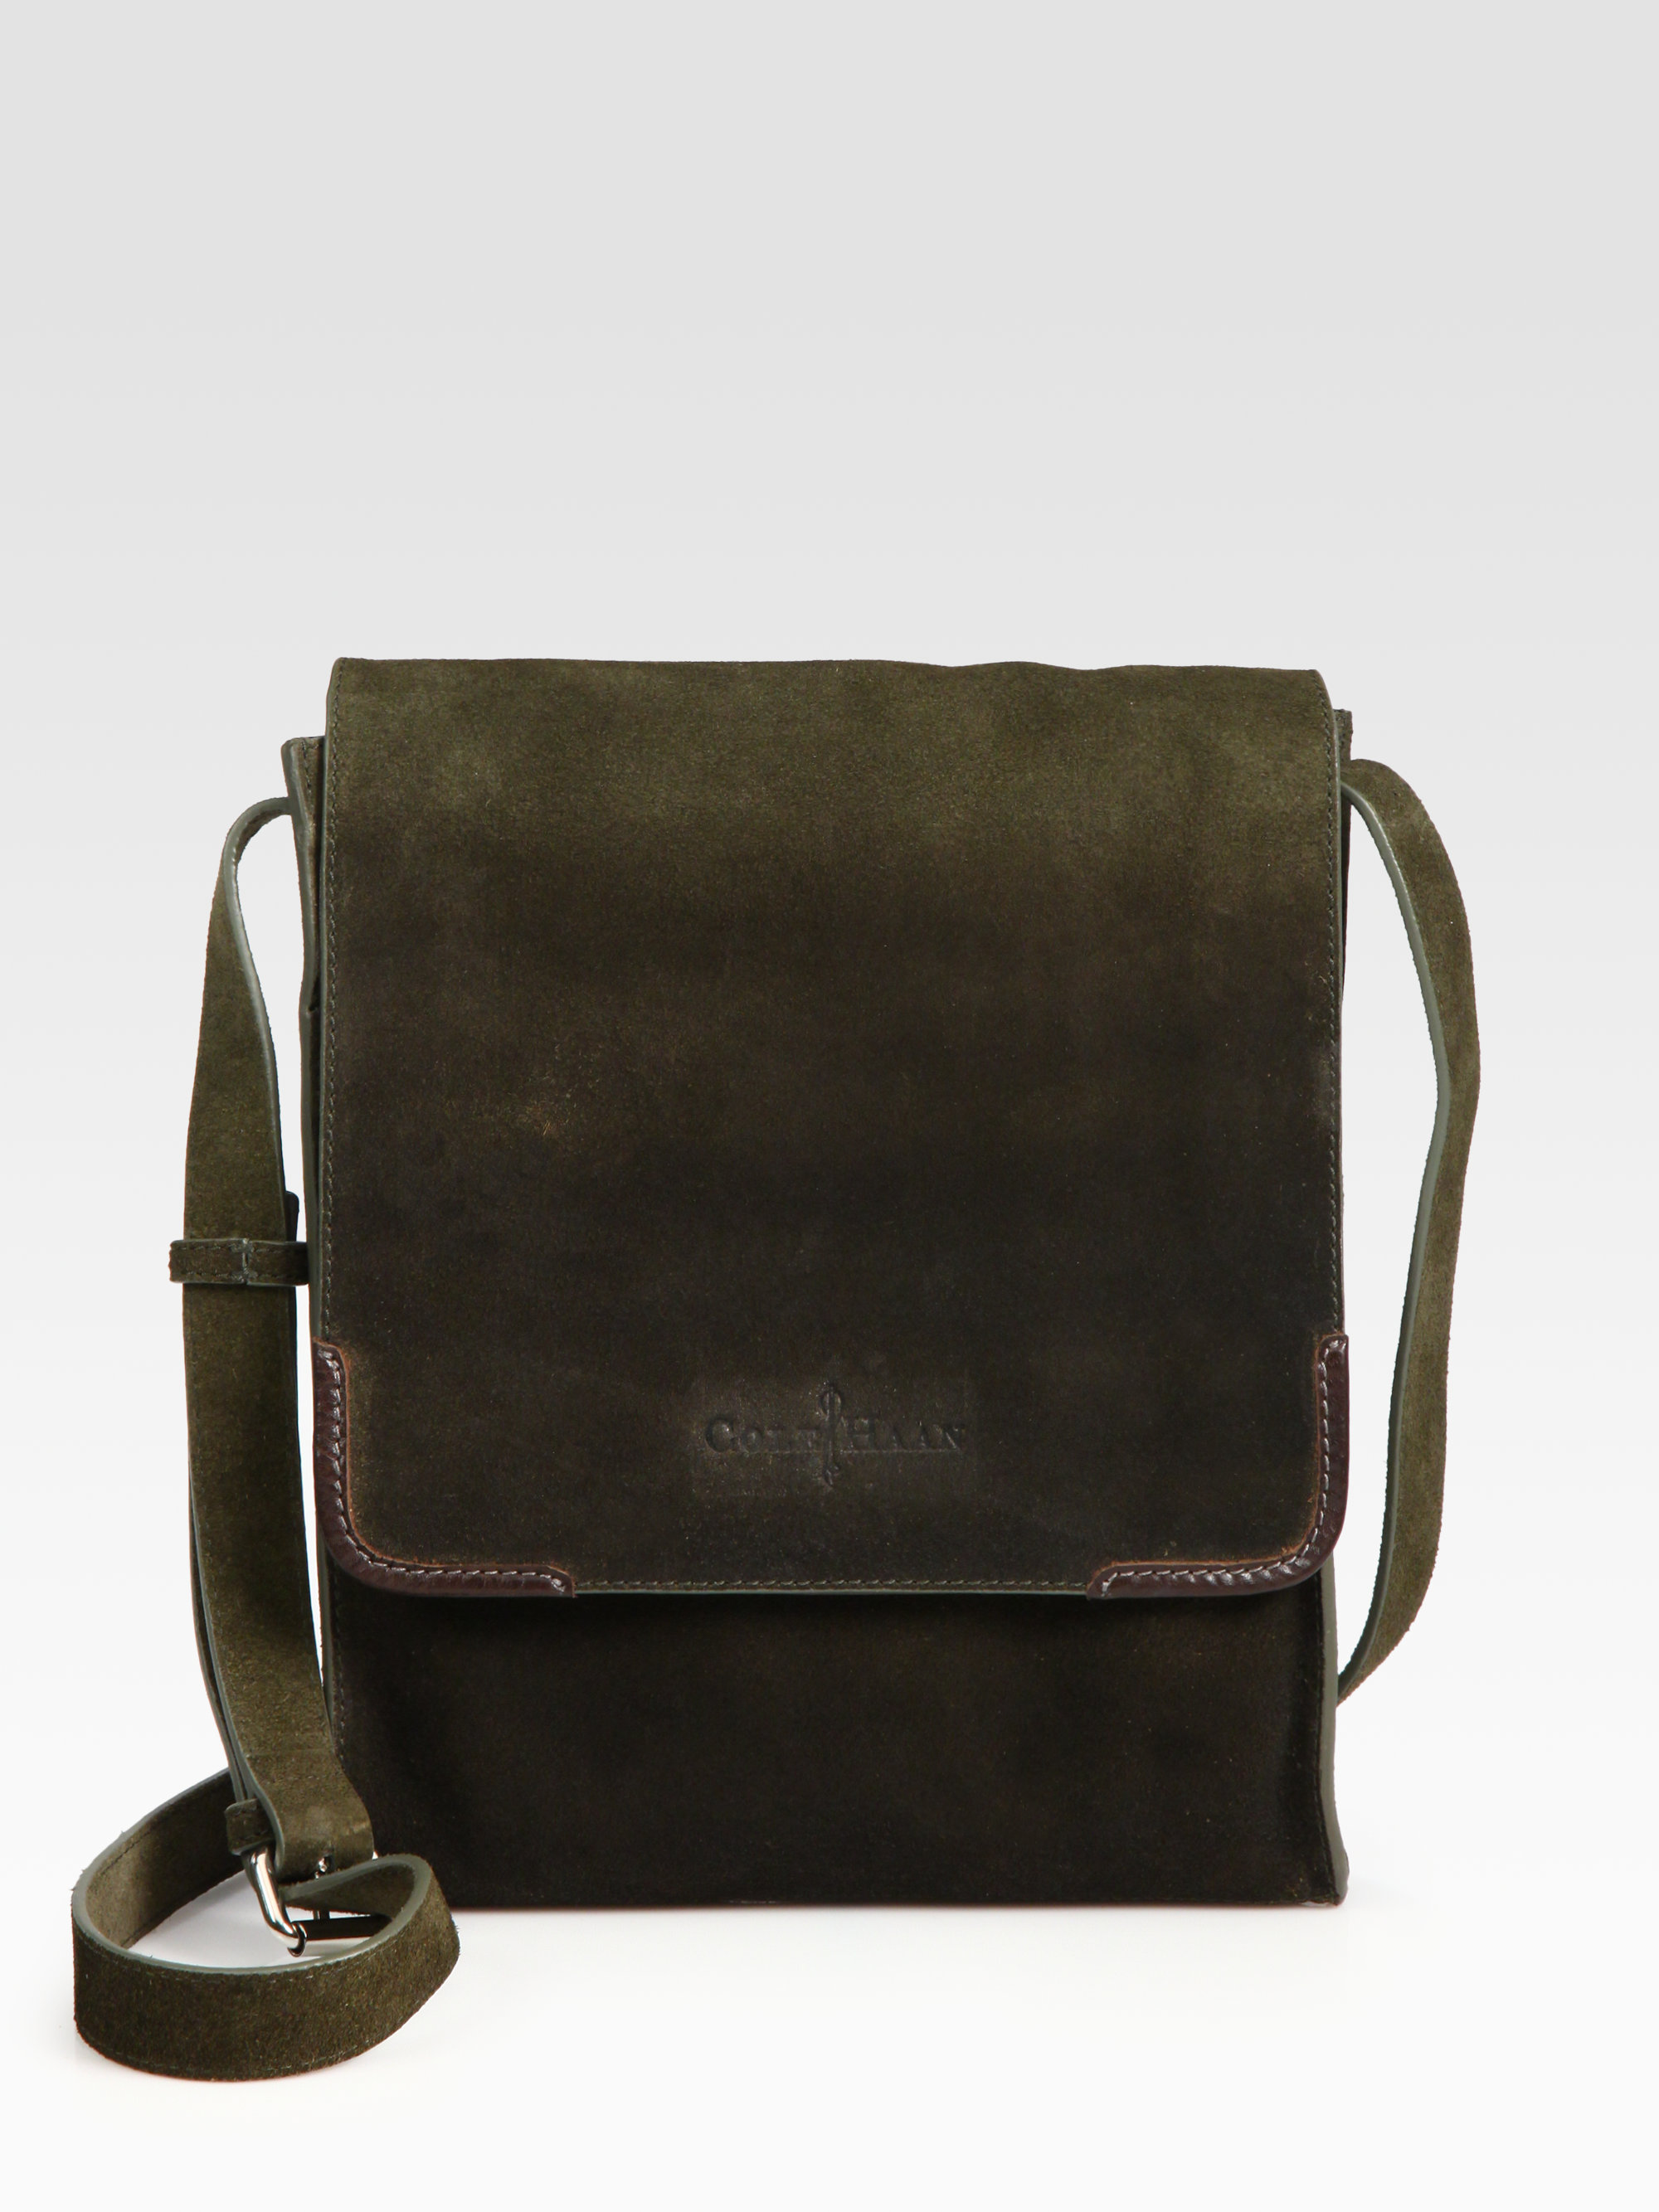 0379e6027f6e Lyst - Cole Haan Merced Newspaper Bag in Black for Men